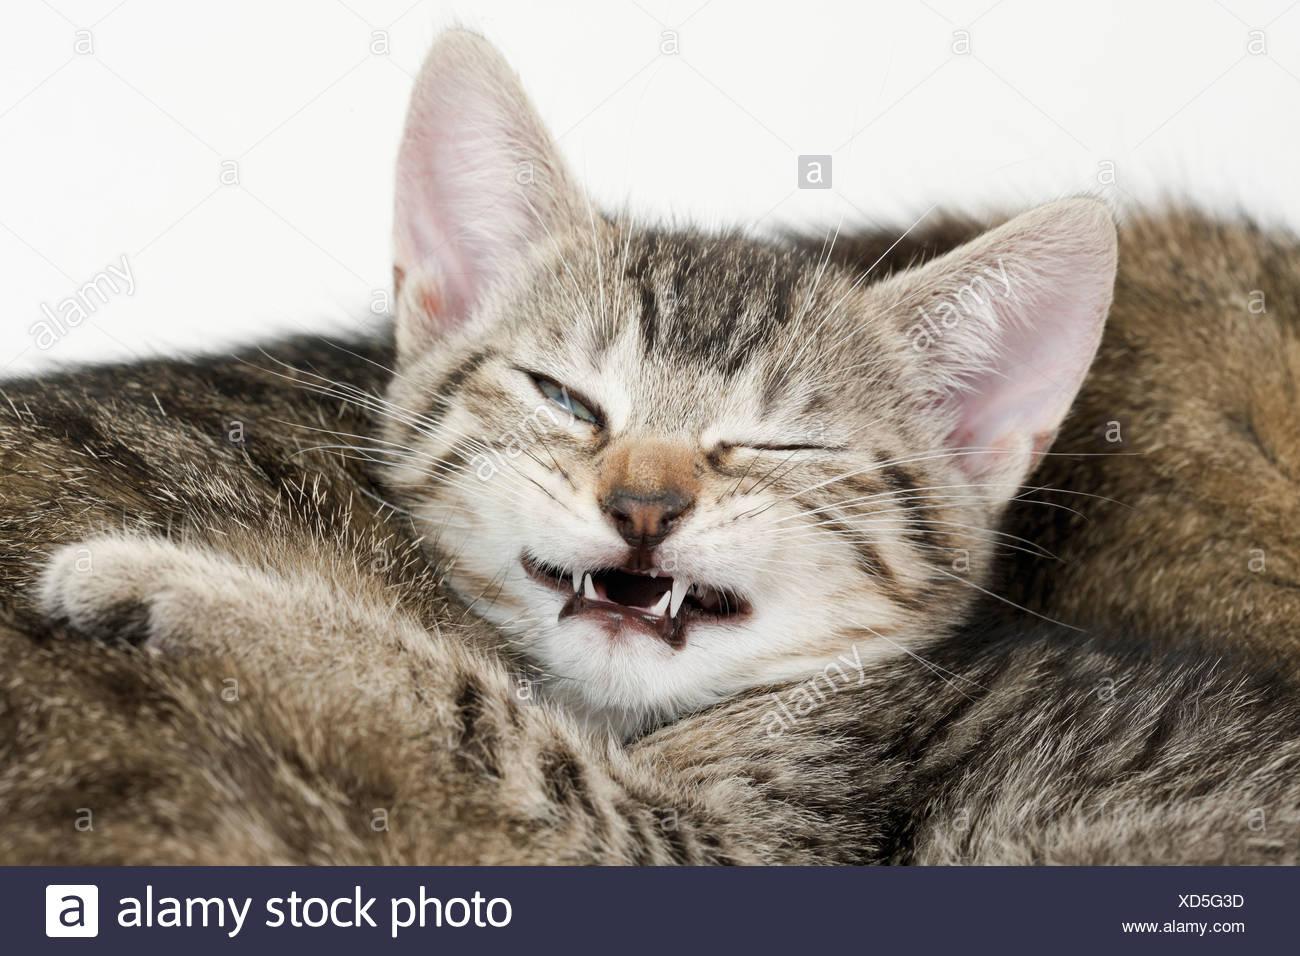 Domestic cat, kitten grimacing, portrait, close-up - Stock Image